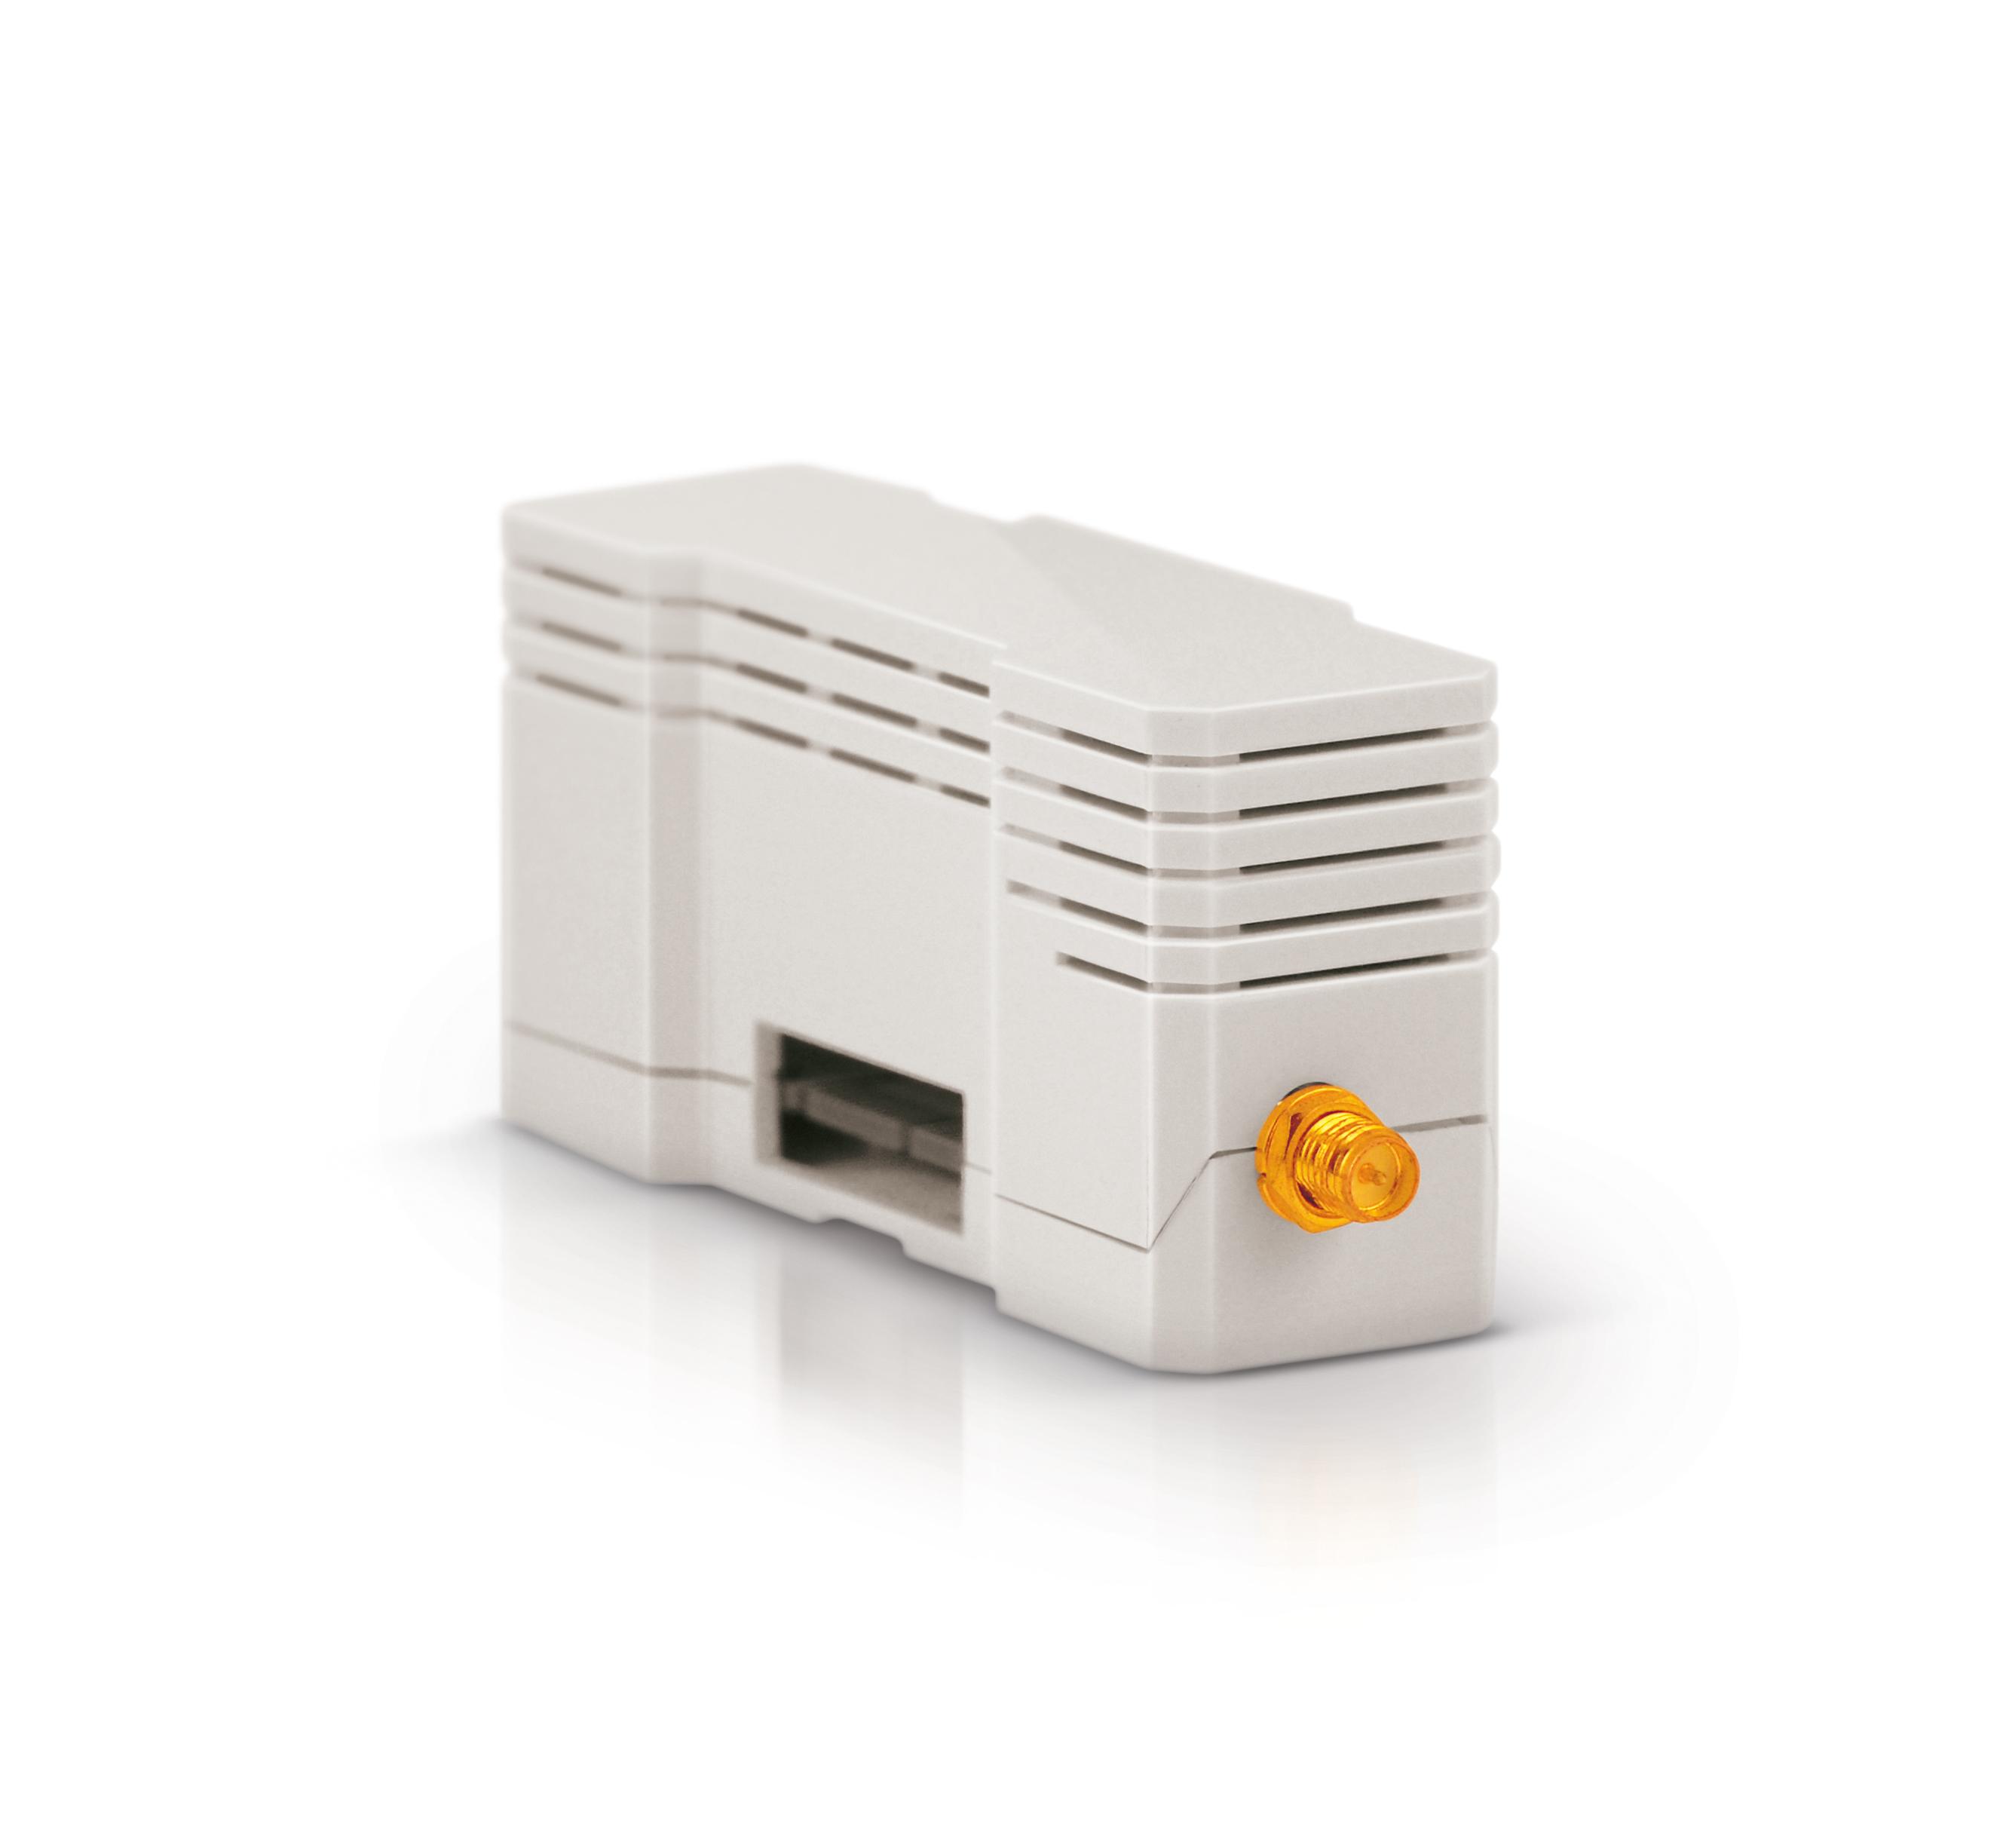 Zipato ZigBee Erweiterungs-Modul (for Zipabox) | Smart Home Gateways ...